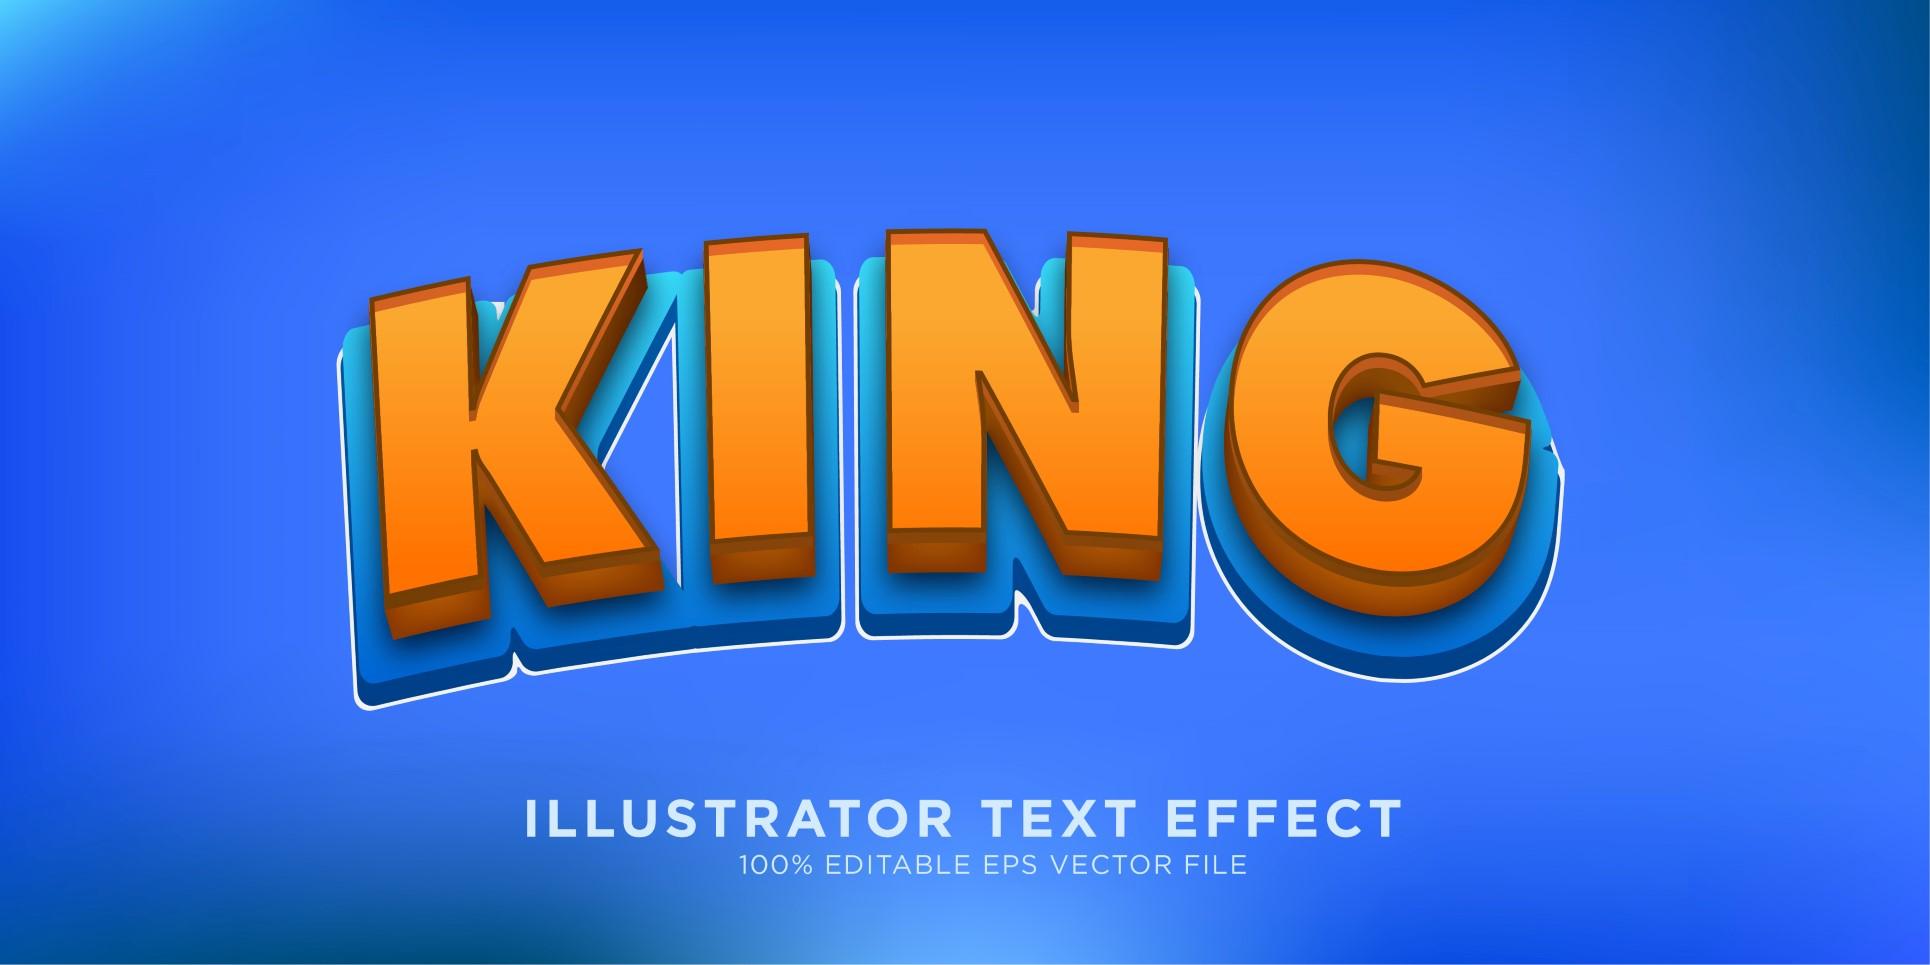 King Illustrator Text Effect Illustration